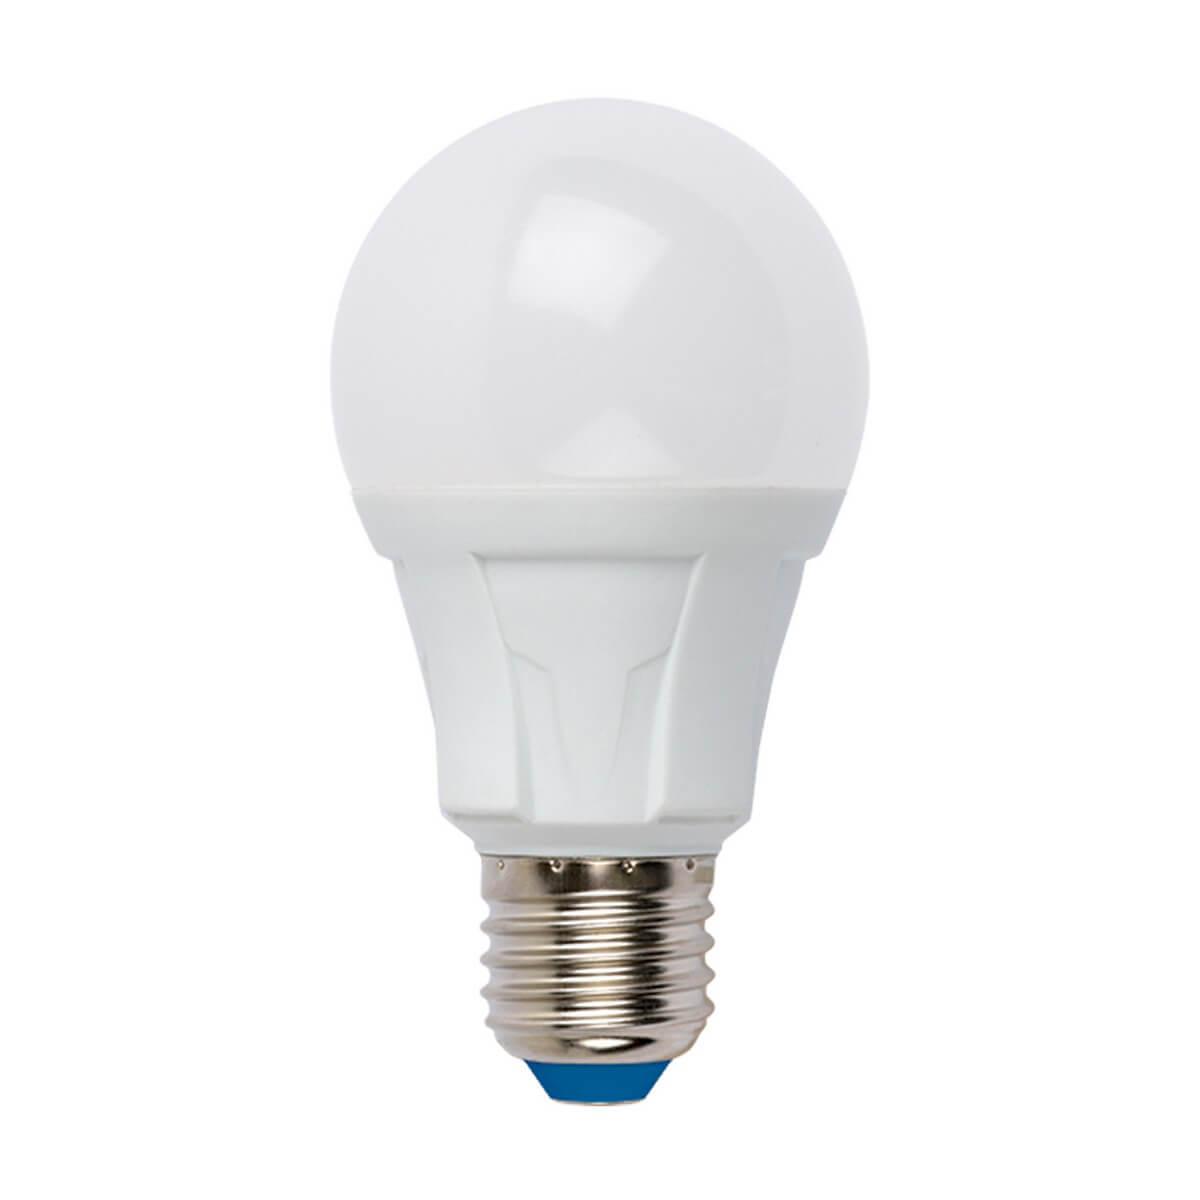 цена на Лампочка Uniel LED-A60 12W/3000K/E27/FR/DIM PLP01WH Яркая (Диммирование)